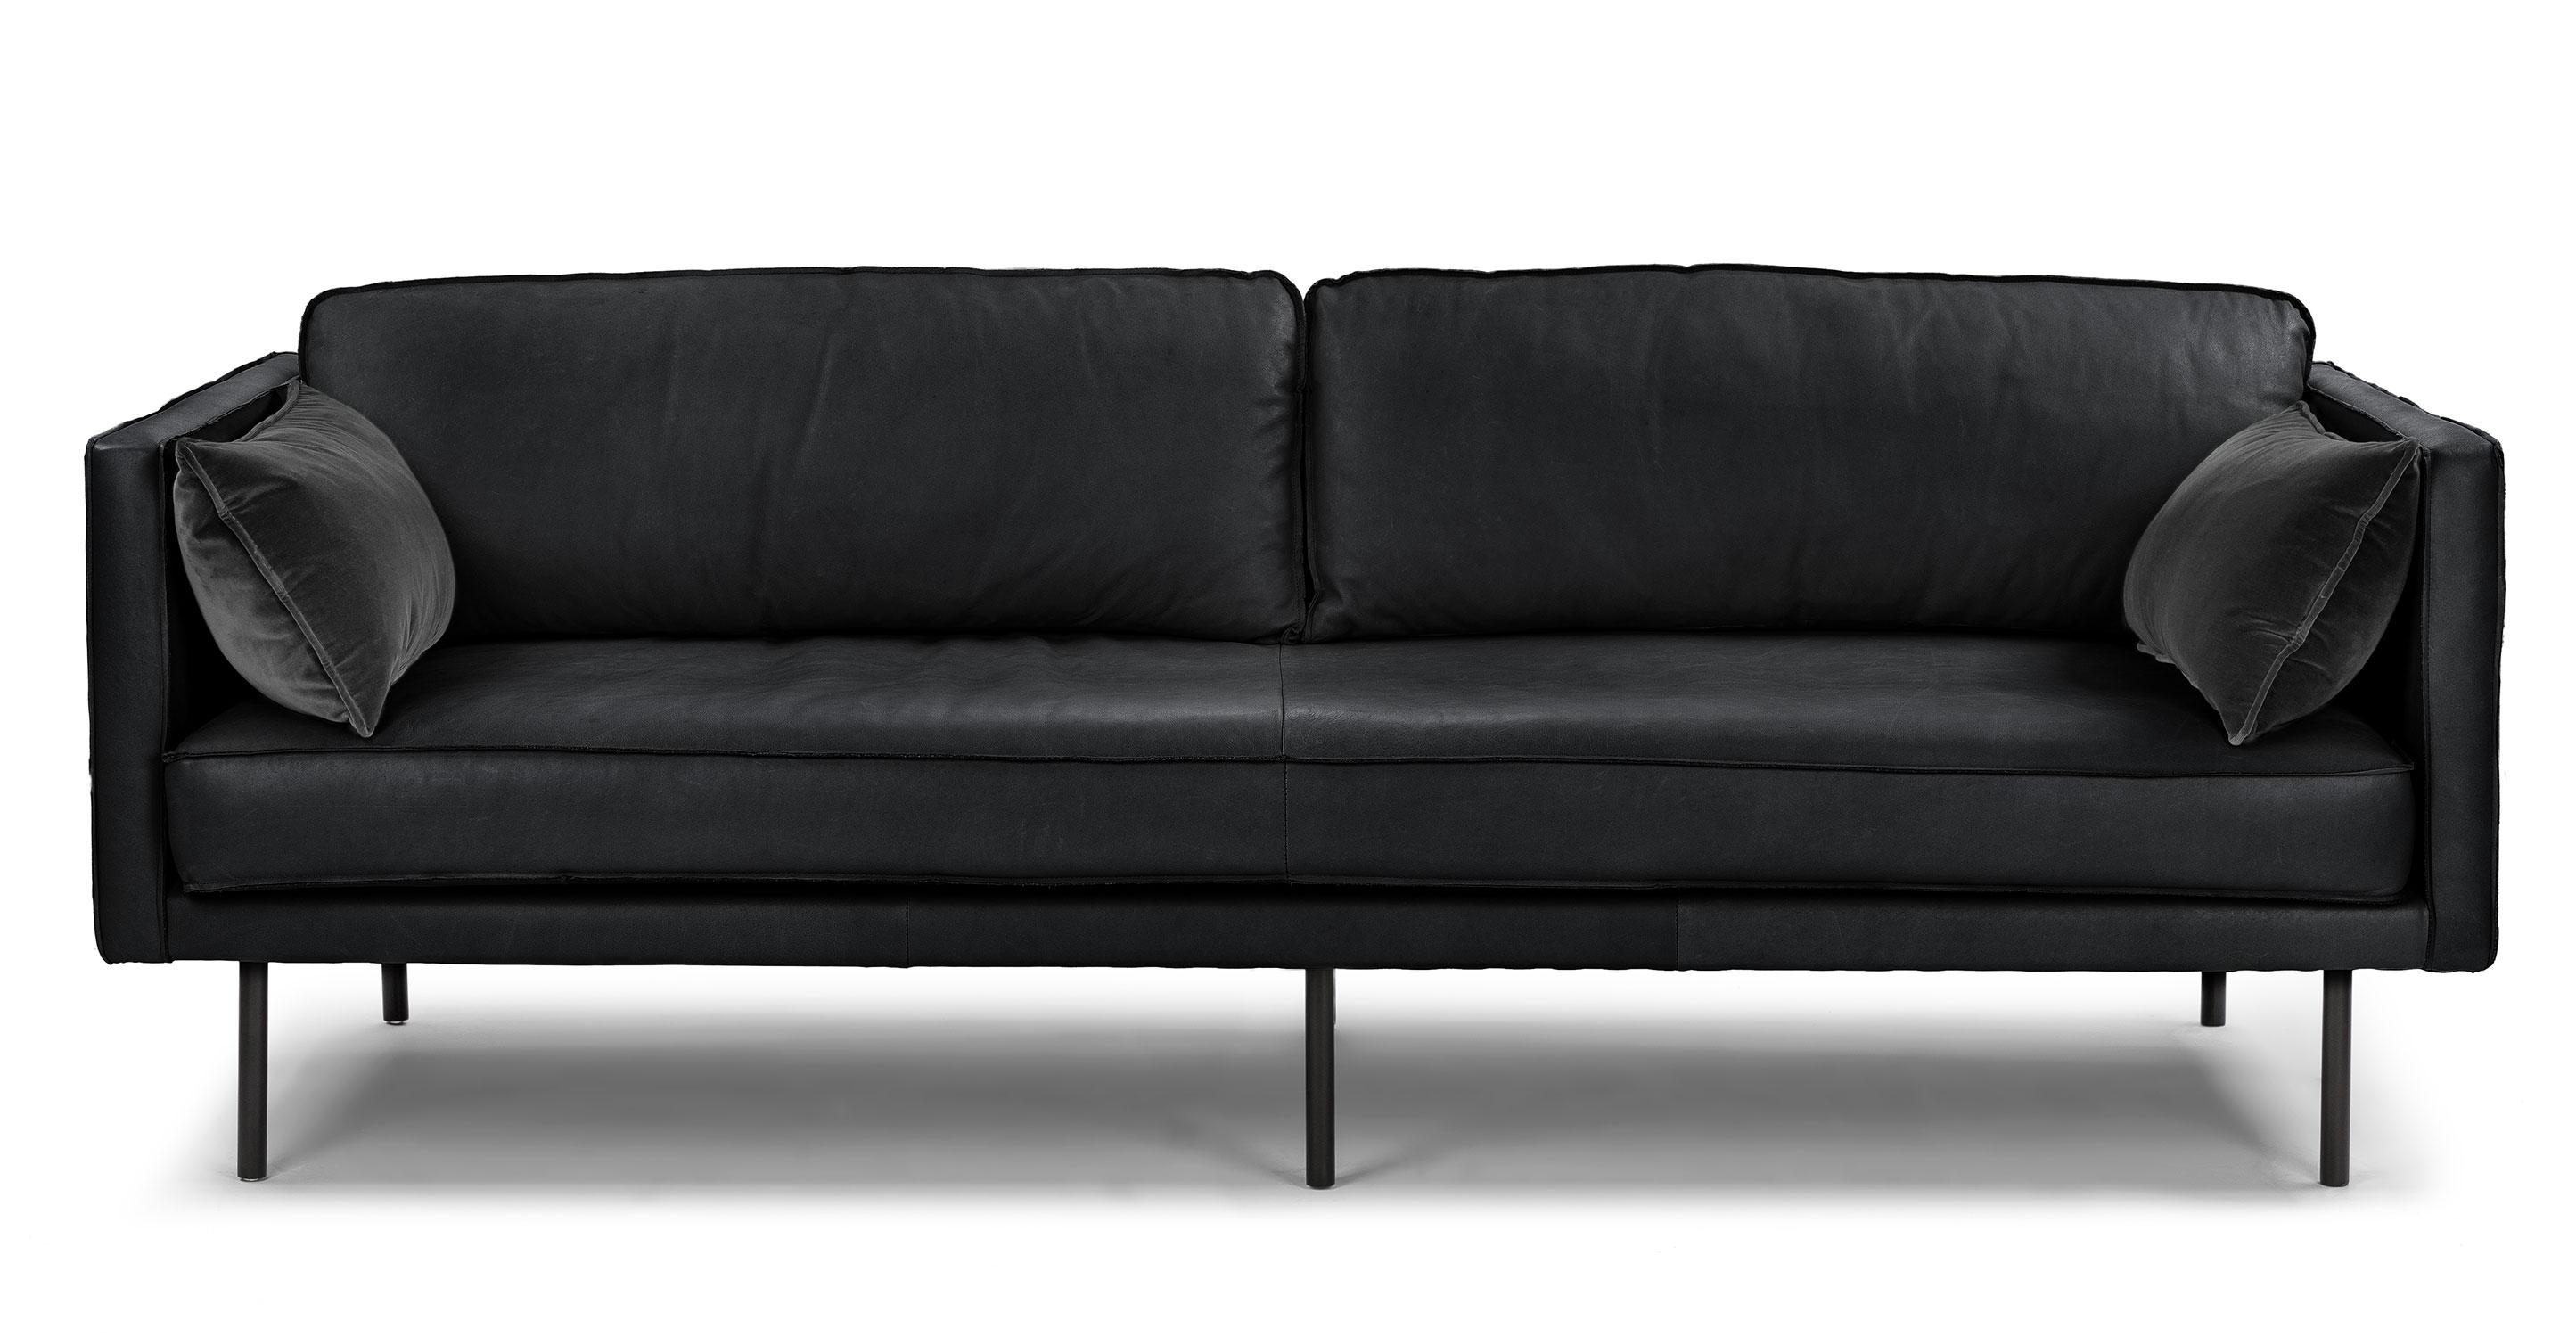 down sofas canada lane sofa recliner release handle capilano charme black article modern mid